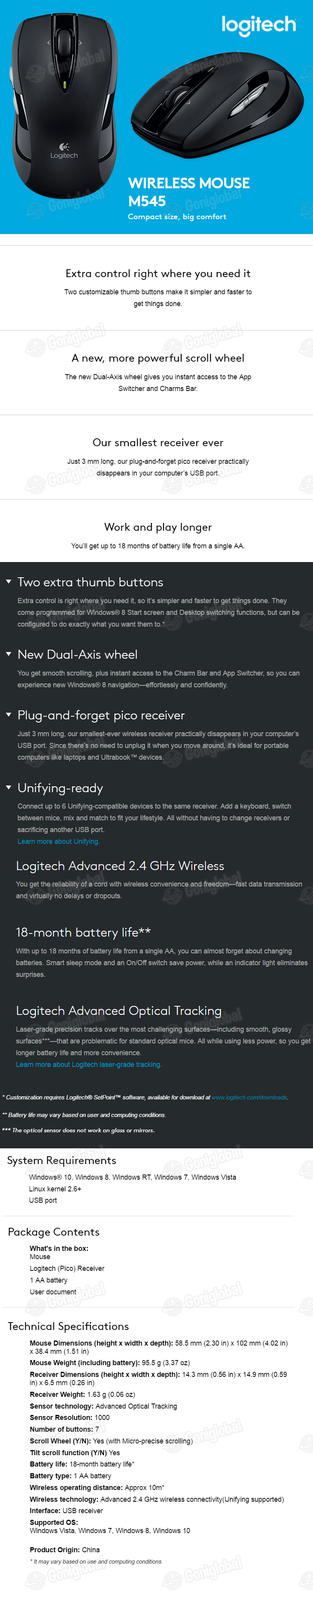 Logitech Logitech Wireless Mouse M545 BLACK / 5 Buttons Mouse / USB Type Mouse /